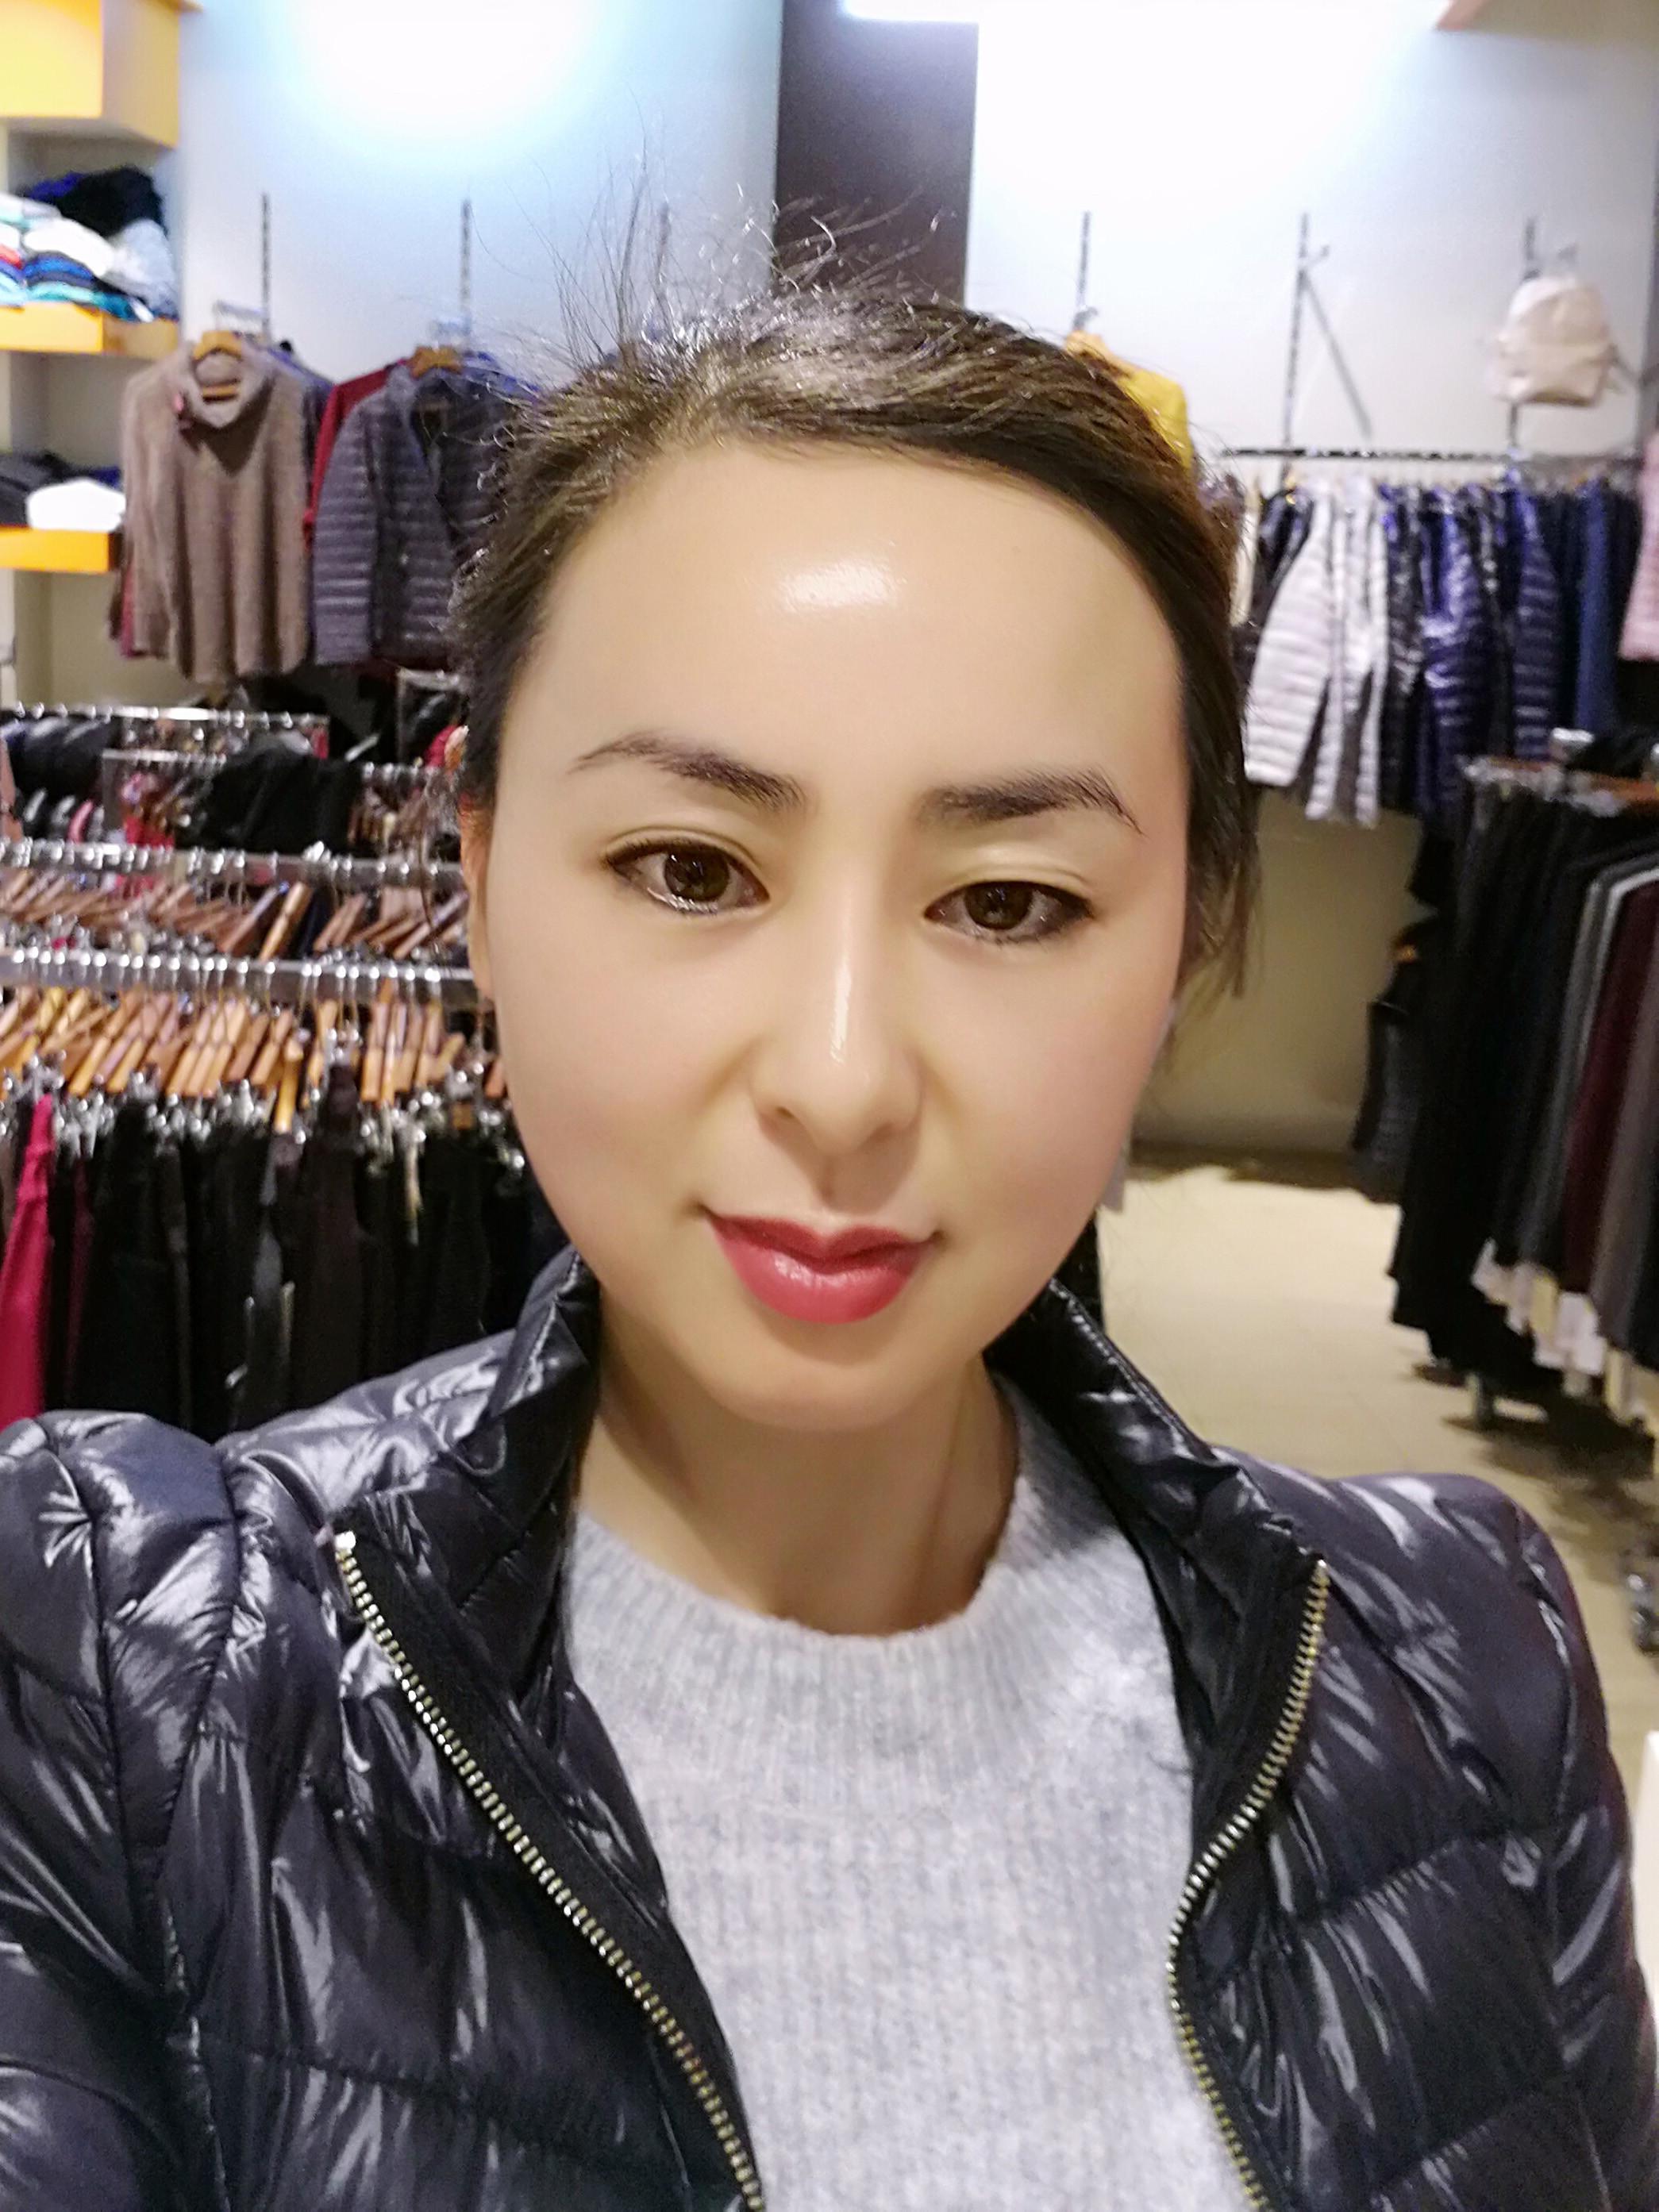 Foto de Huawei P10 Plus, selfies a tamaño completo (19/20)